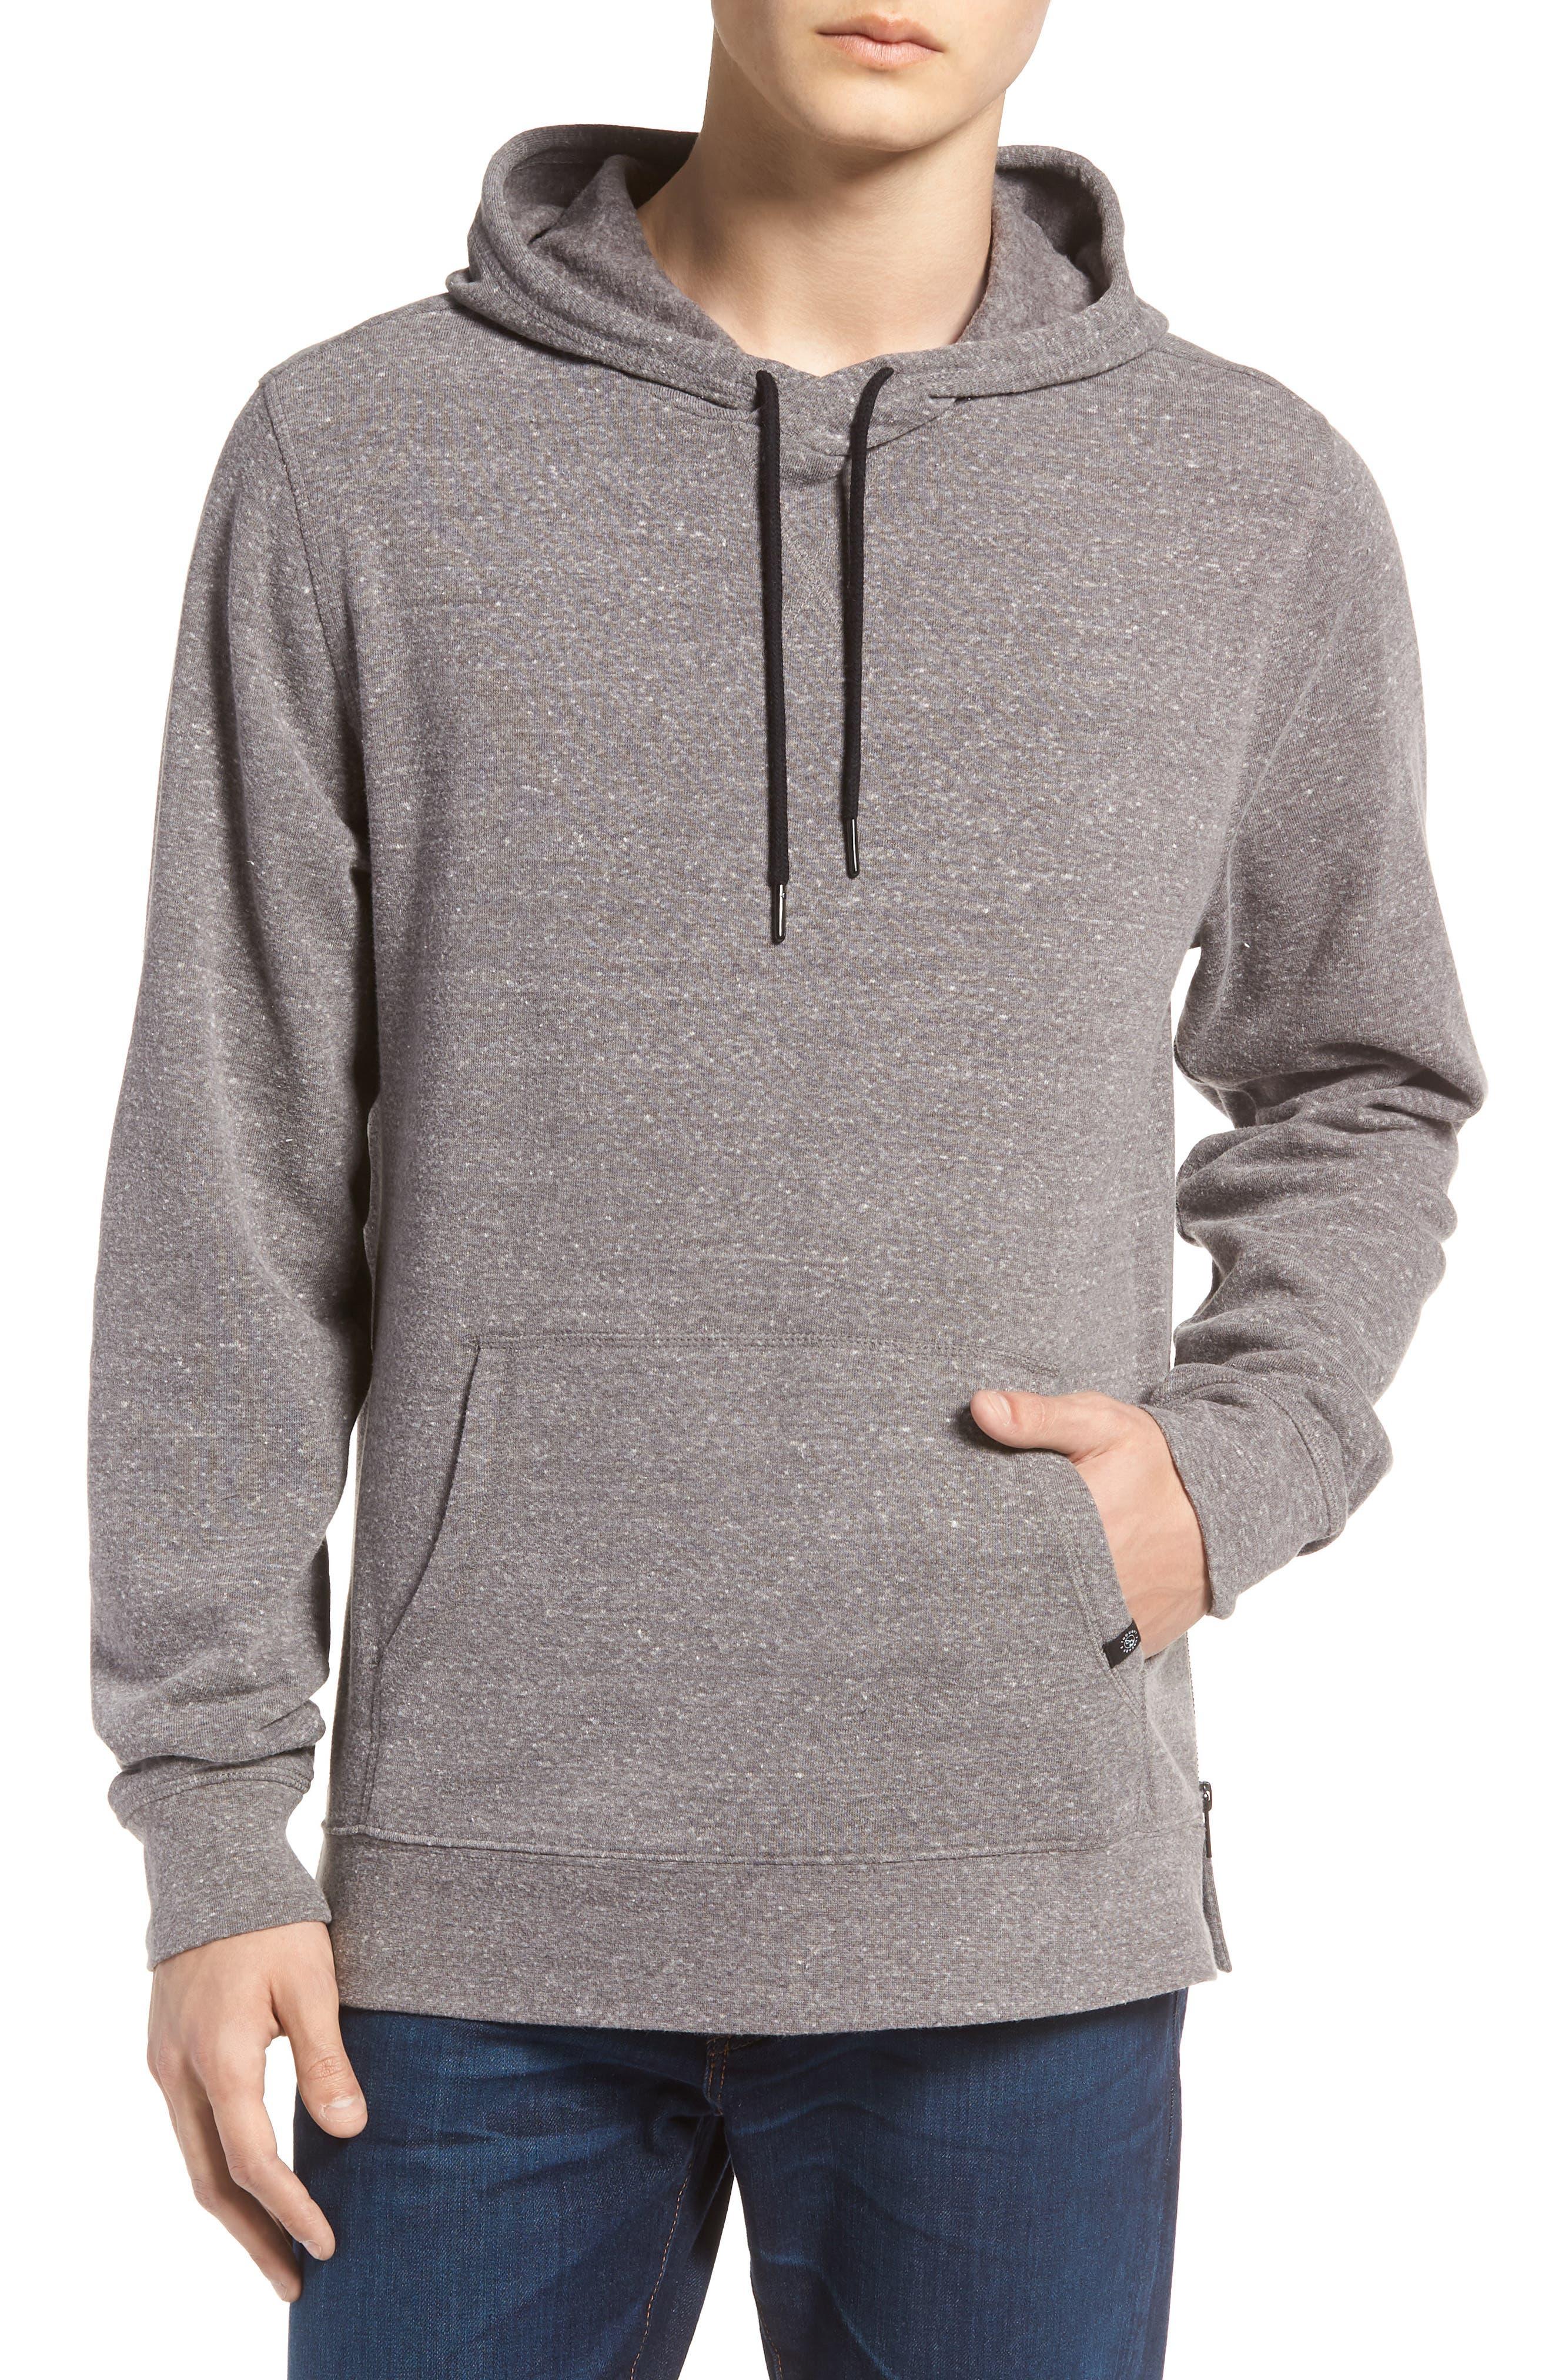 Barkeley Side Zip Hoodie Sweatshirt,                         Main,                         color, 020